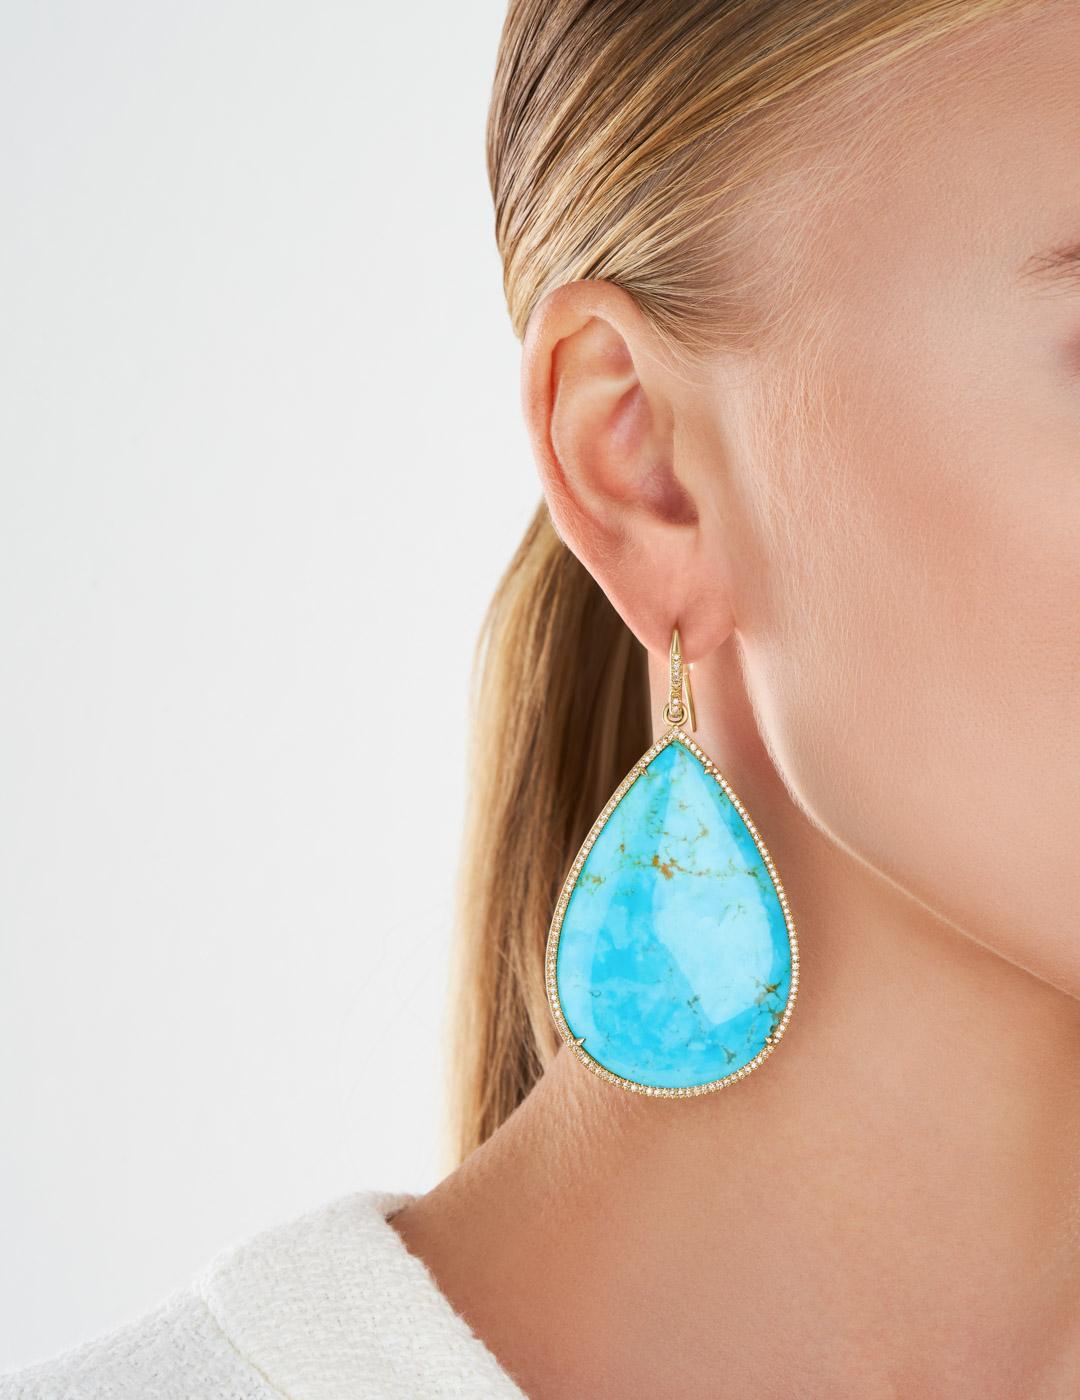 mish_products_earrings_Lexington-Turq-ER-2